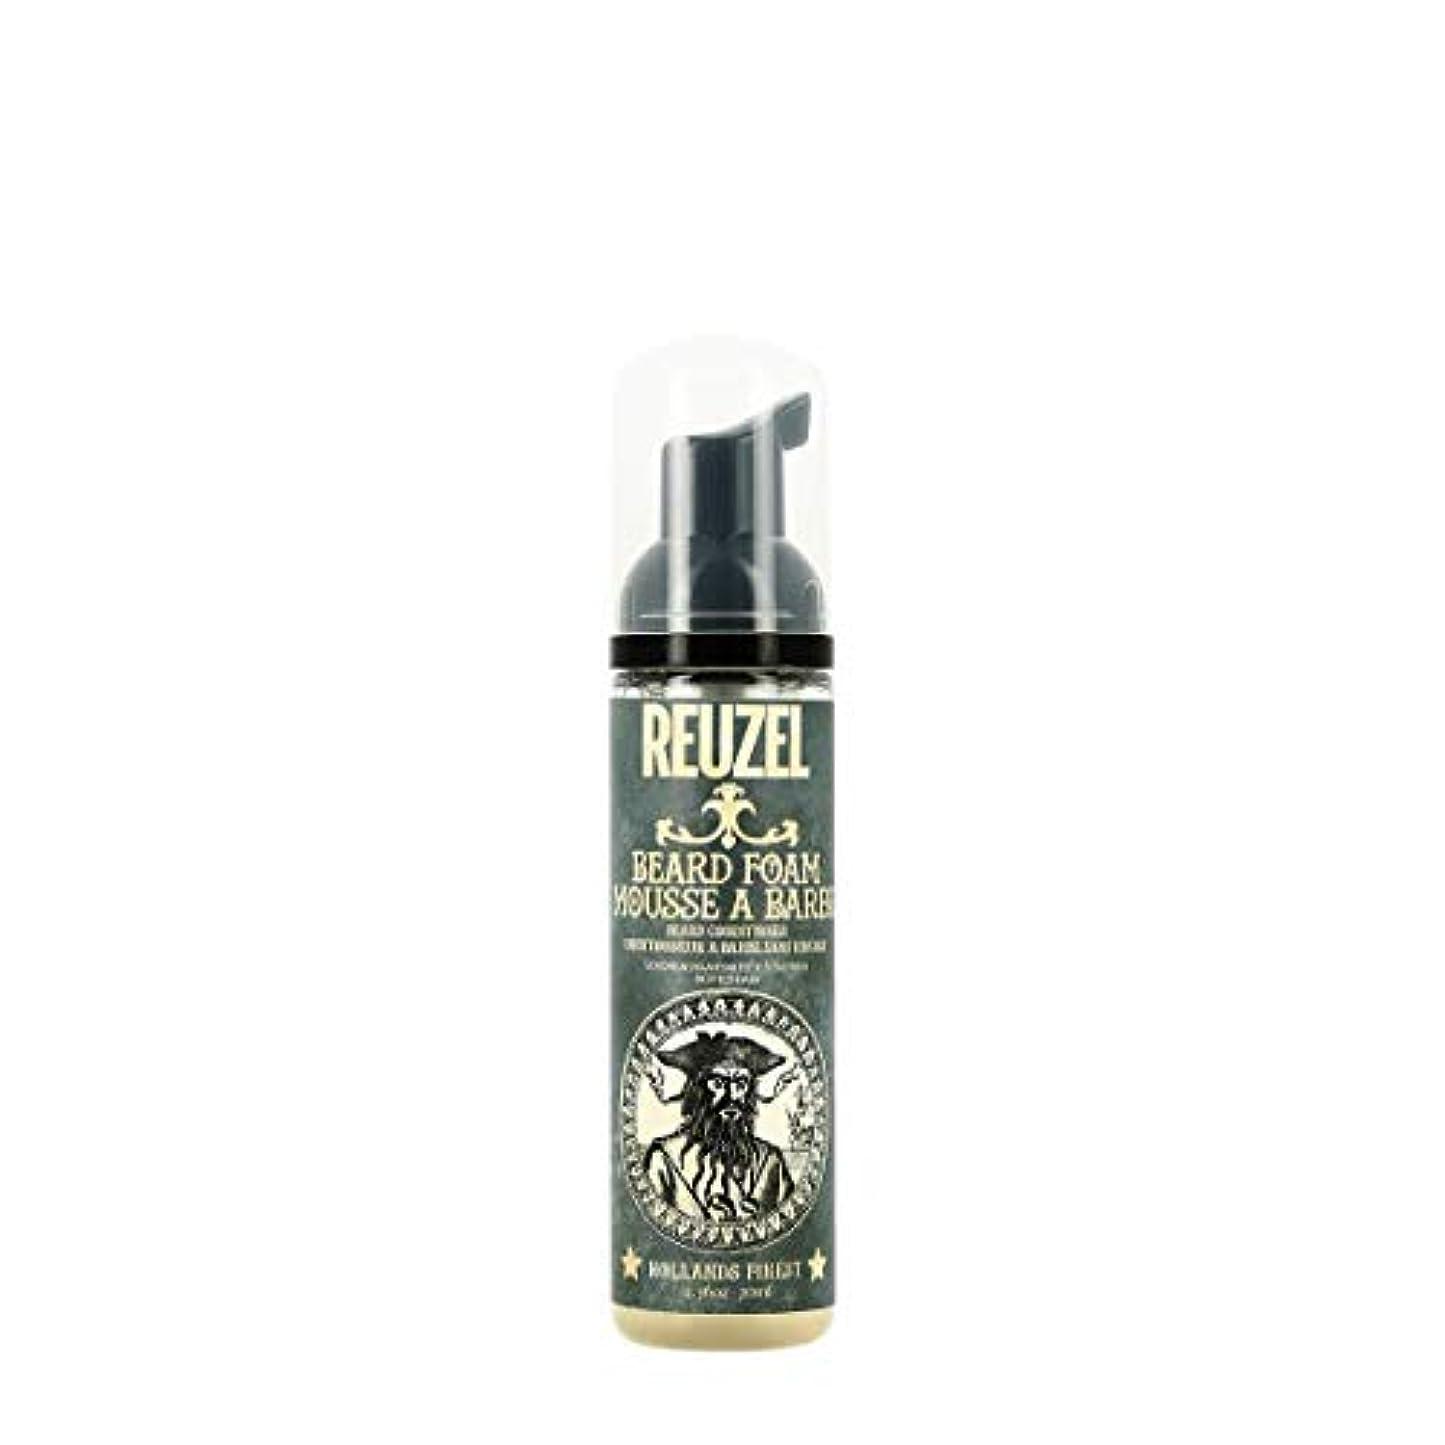 効率的媒染剤退却ルーゾー Reuzel Beard Foam - Beard Conditioner 70 ml [並行輸入品]